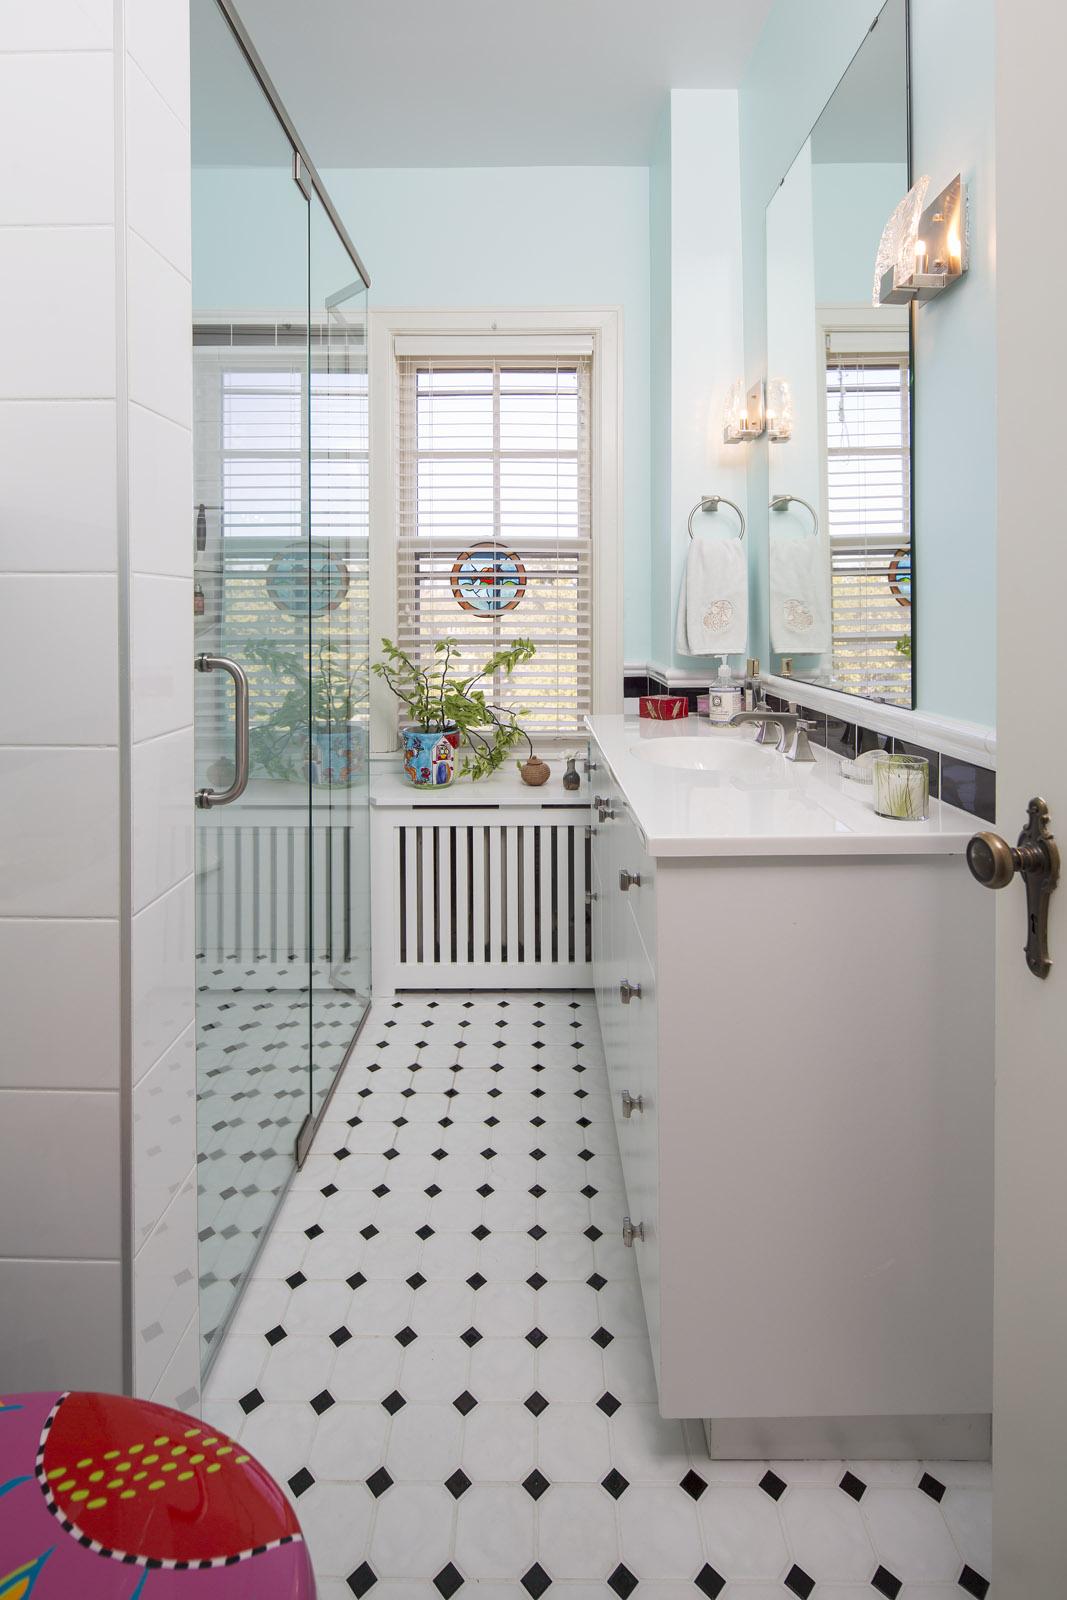 Martin | Bathroom | After #1